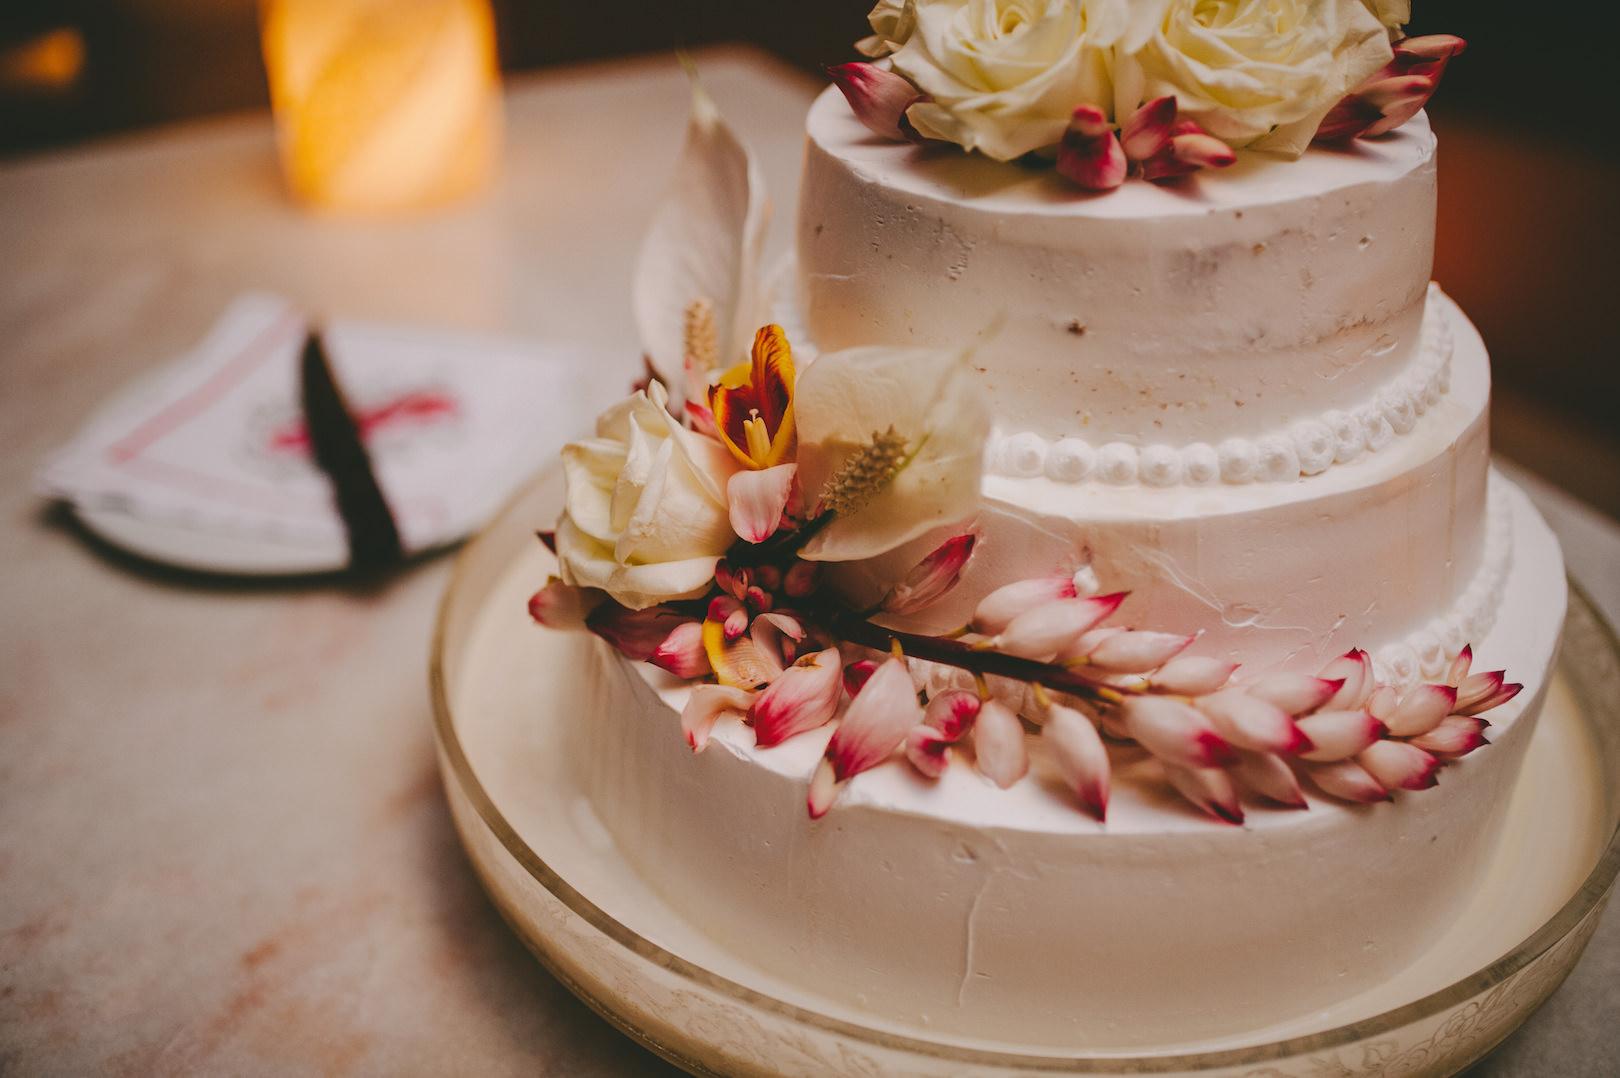 Nathan & Felicia - Wedding Day - © Dallas Kolotylo Photography - 726